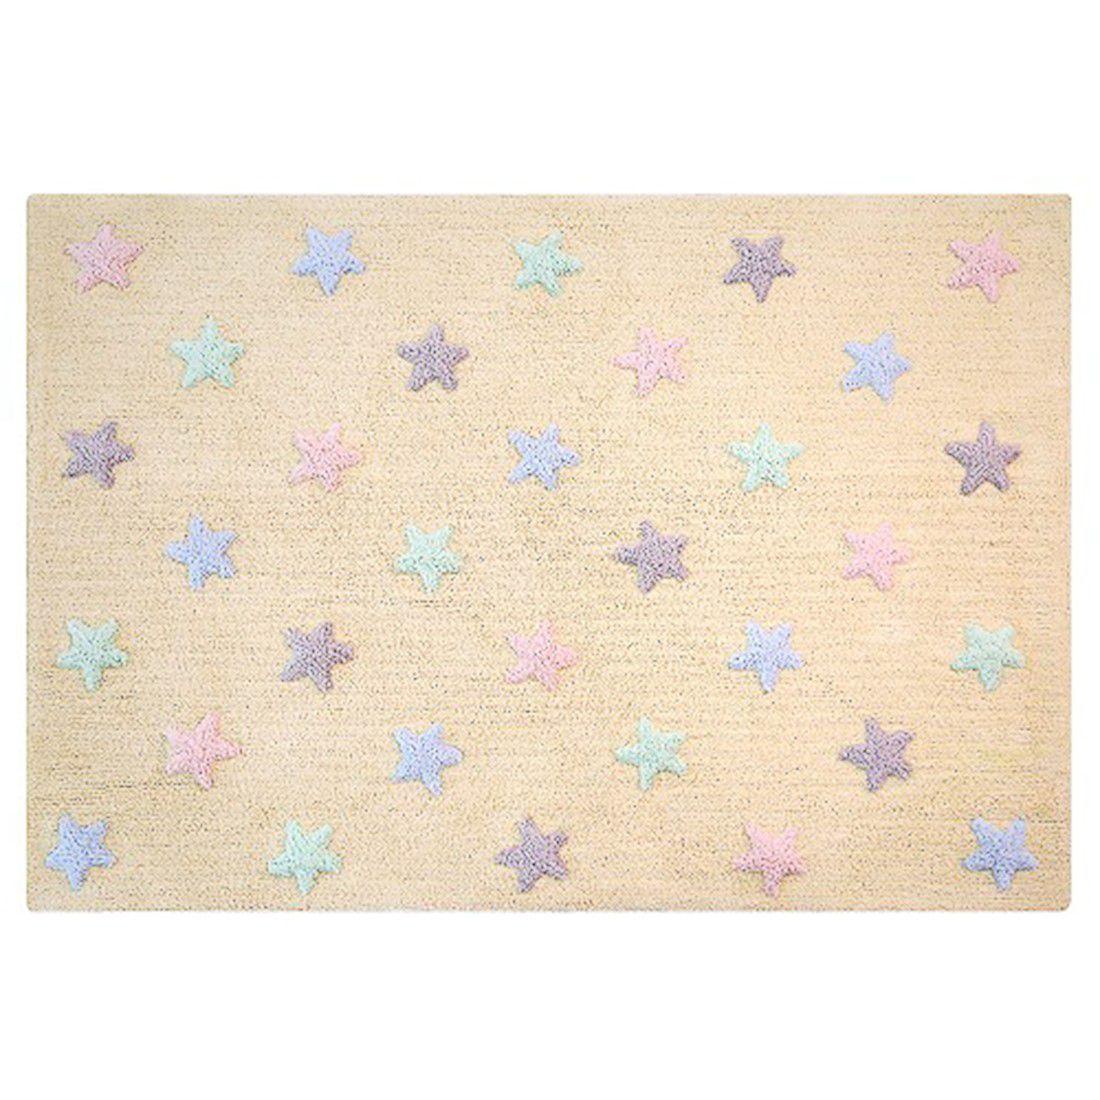 Tapete Lorena Canals Estrelas Tricolor Baunilha 120 x 160 cm